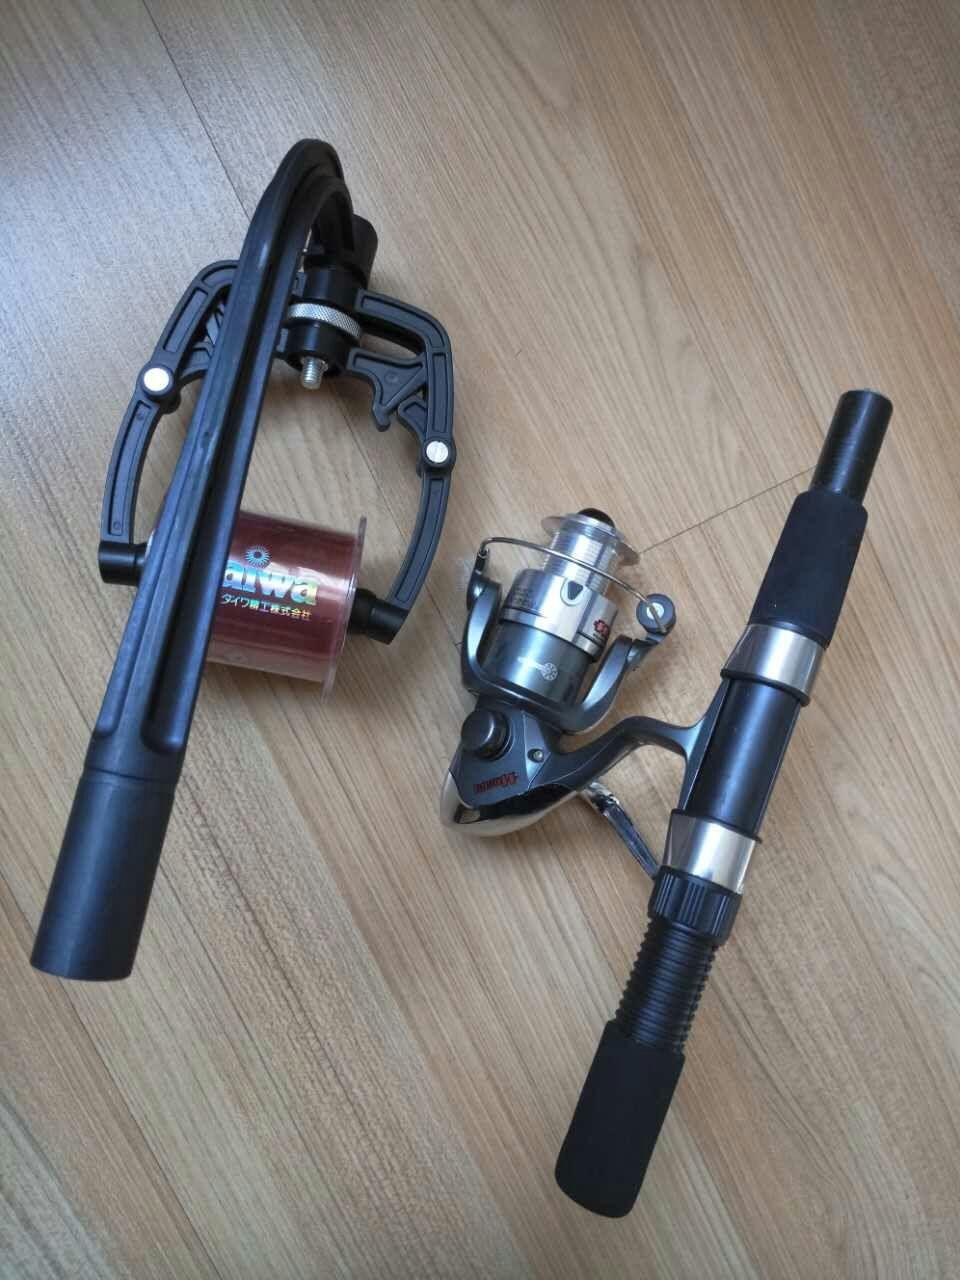 Exclusive Fishing Reel Line Winder Spooler Fishing Line Winding System Spinning Line Tier Fishing Tools Accessory